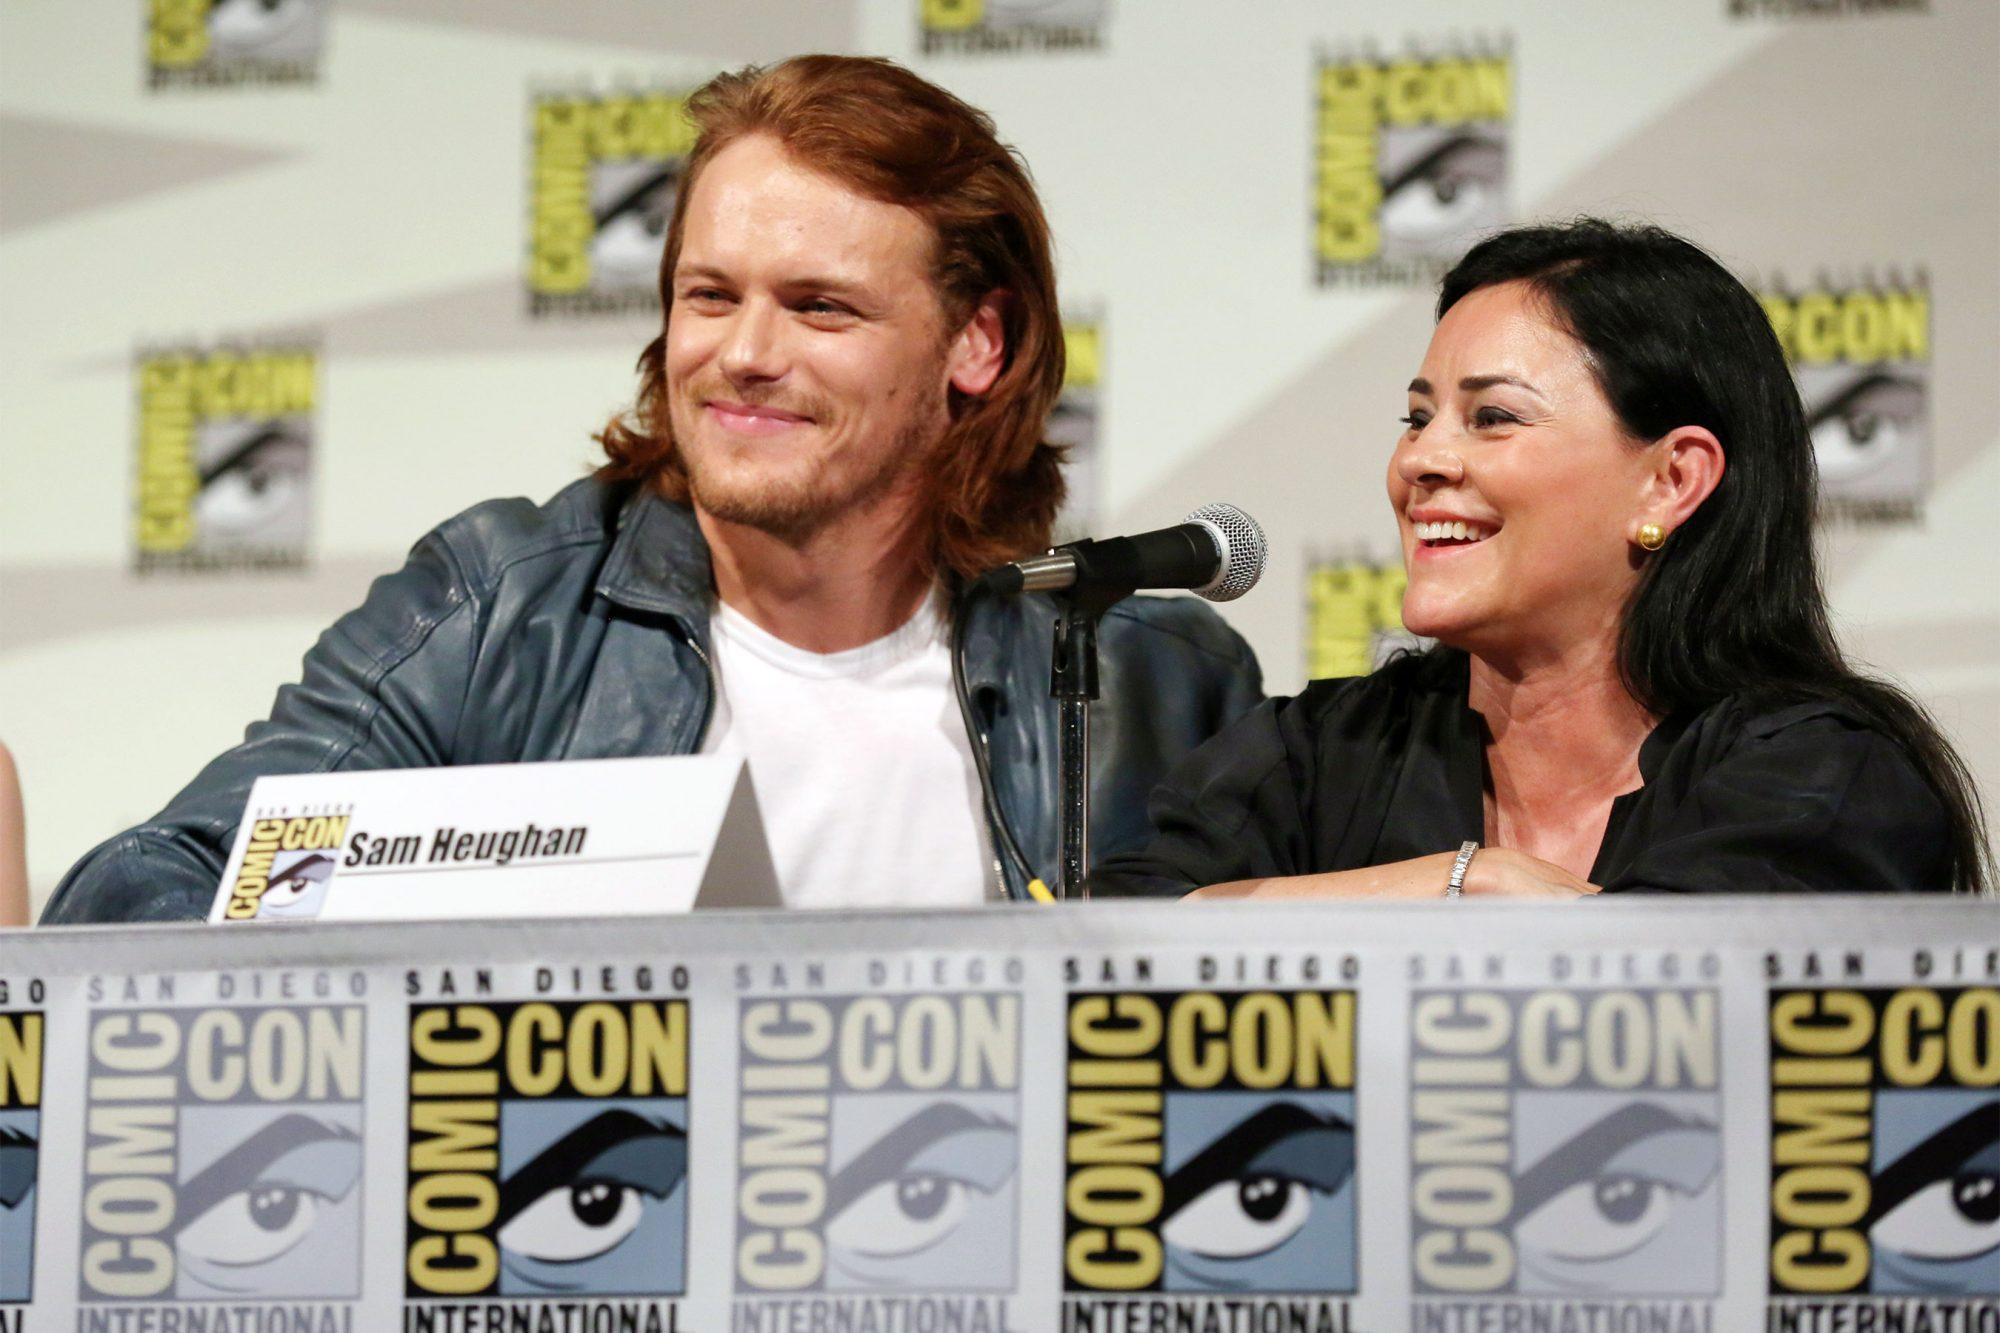 Starz Outlander at Comic-Con - Day 2, San Diego, USA